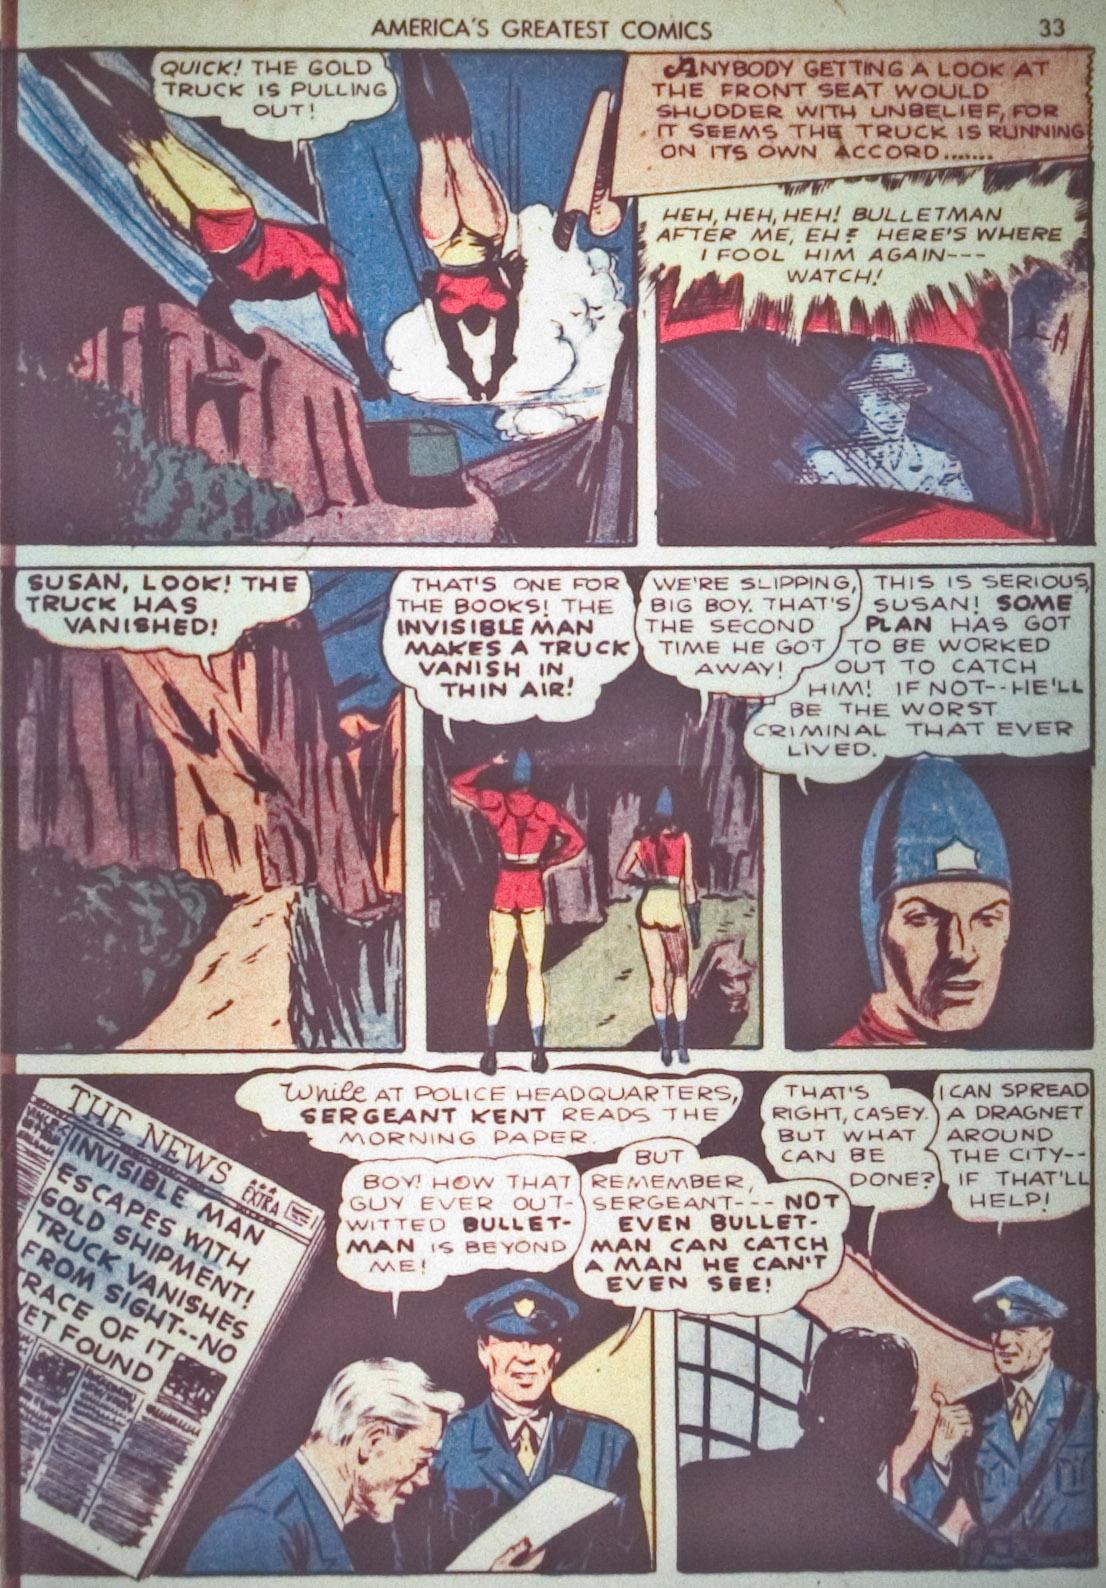 Read online America's Greatest Comics comic -  Issue #1 - 36